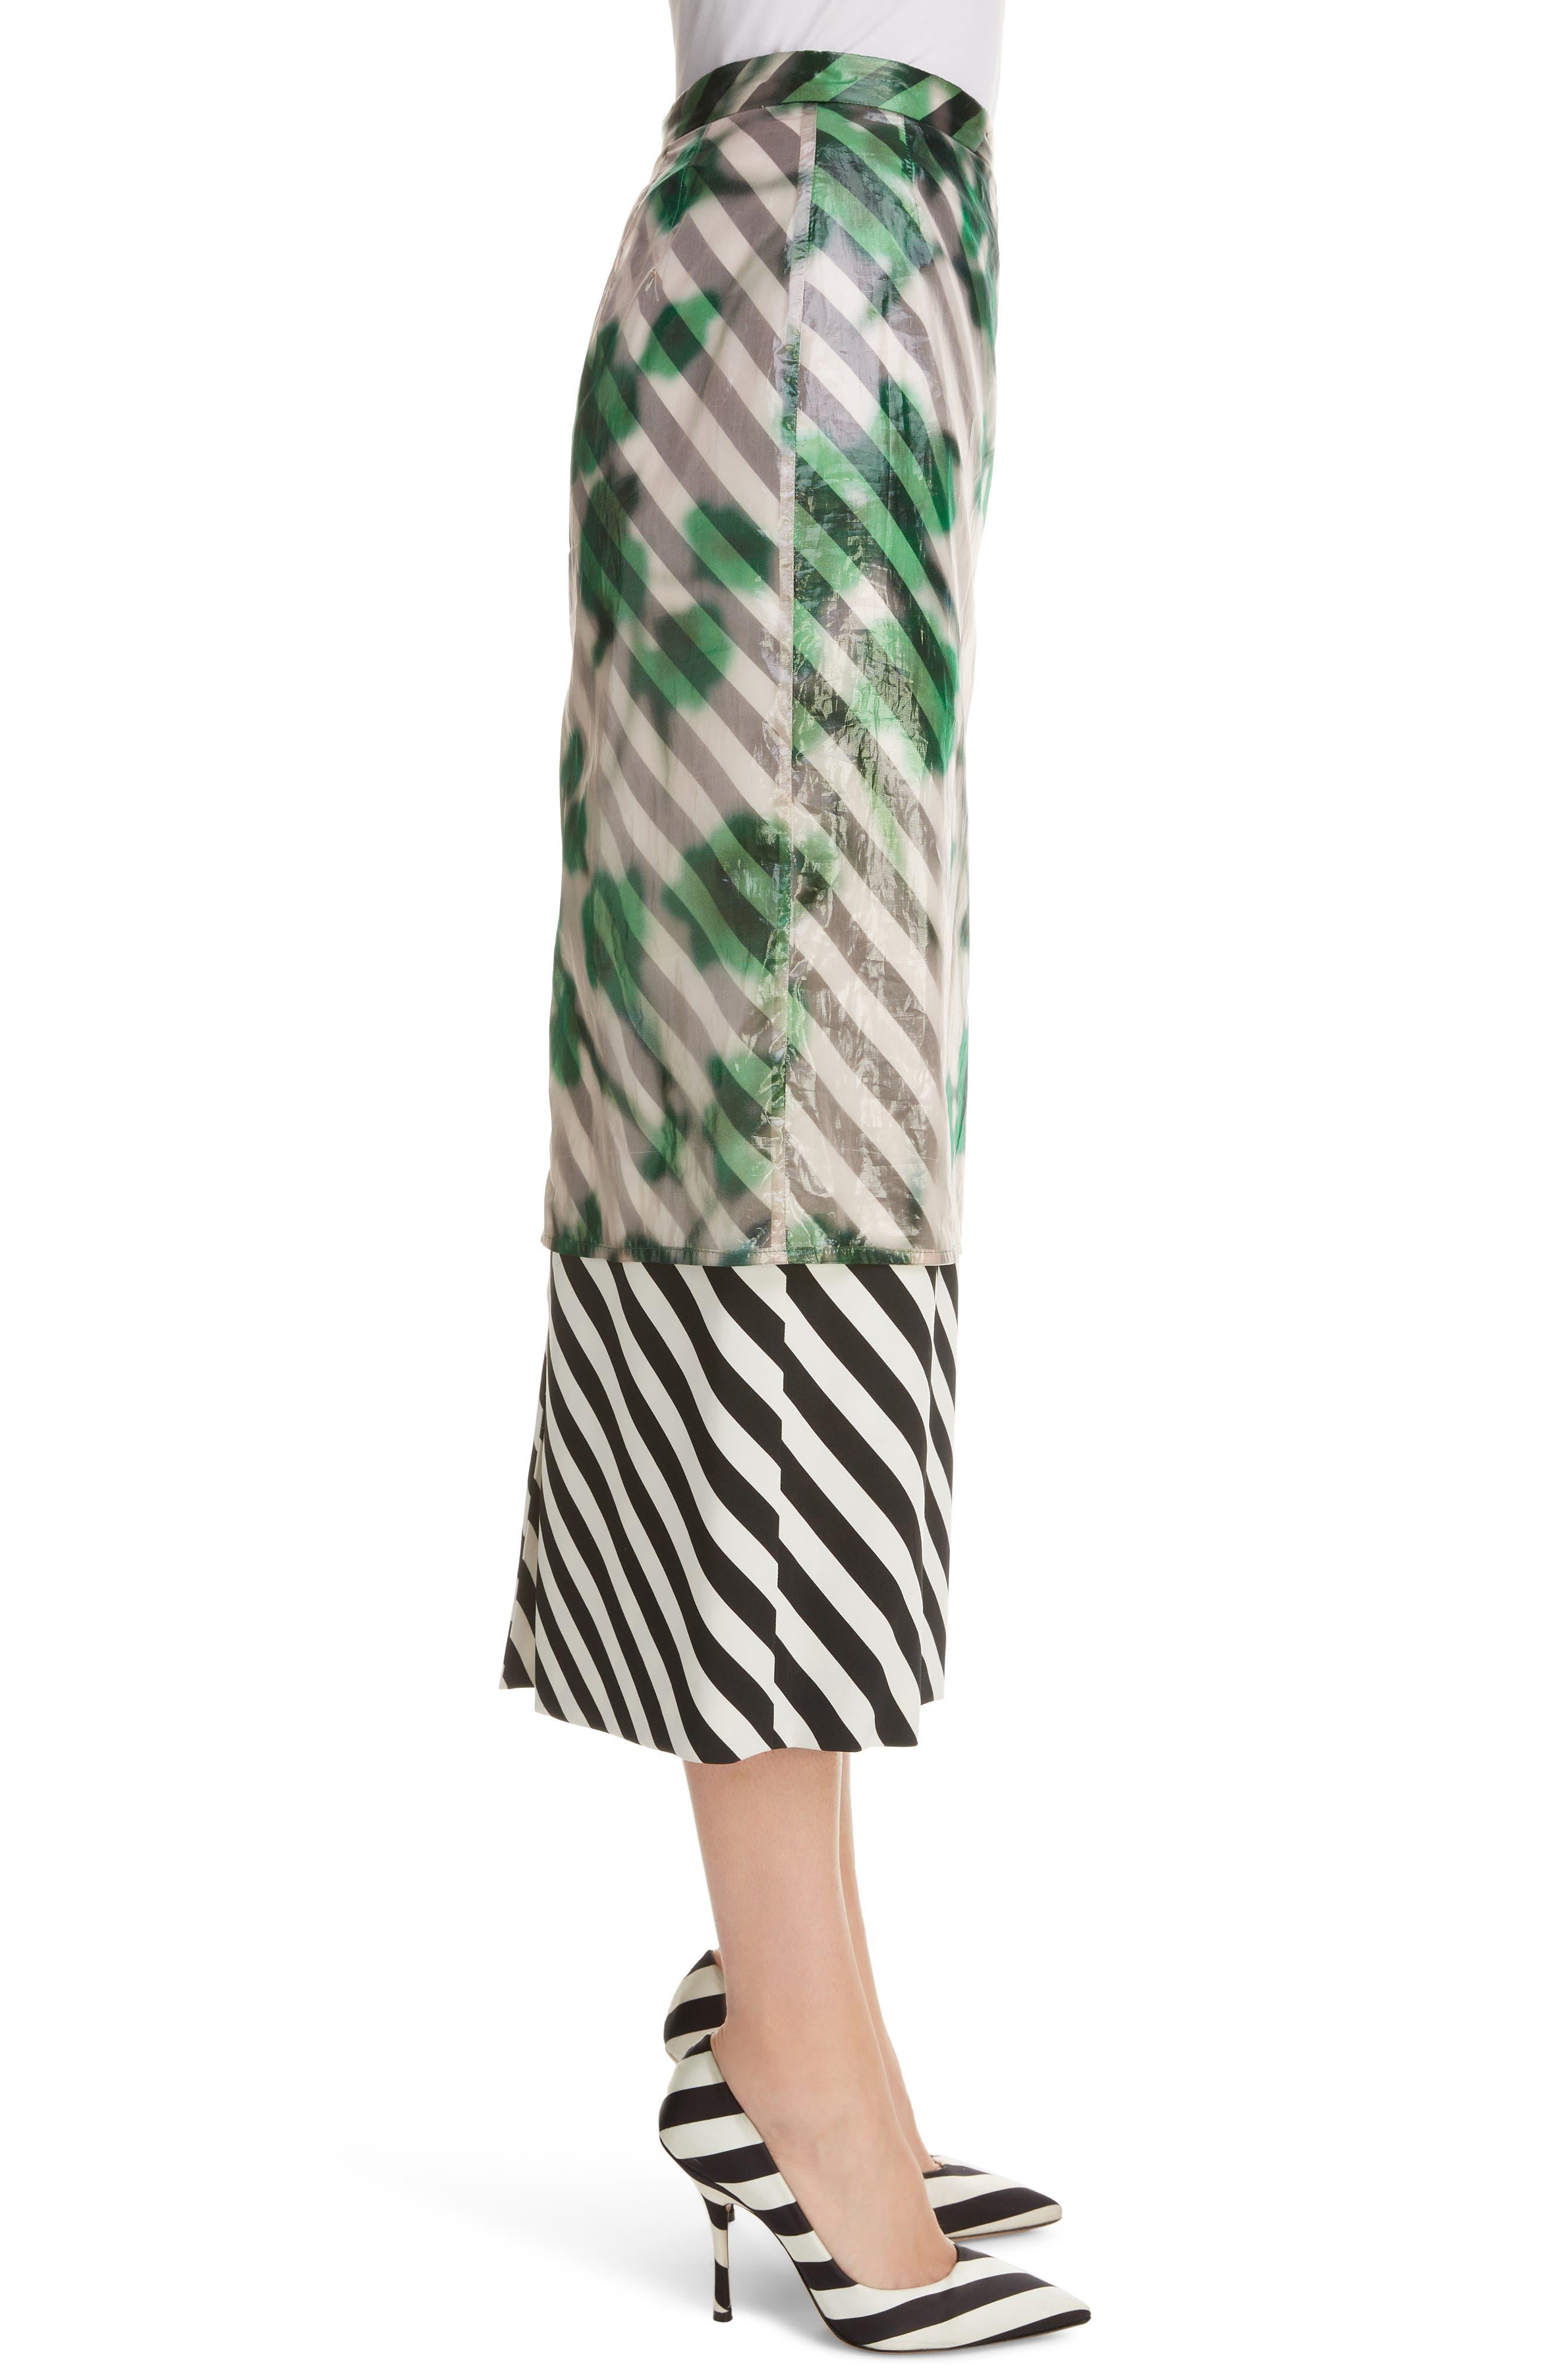 DRIES VAN NOTEN, Dires Van Noten Painted Overlay Silk Blend Pencil Skirt, Alternate thumbnail 3, color, 604-GREEN